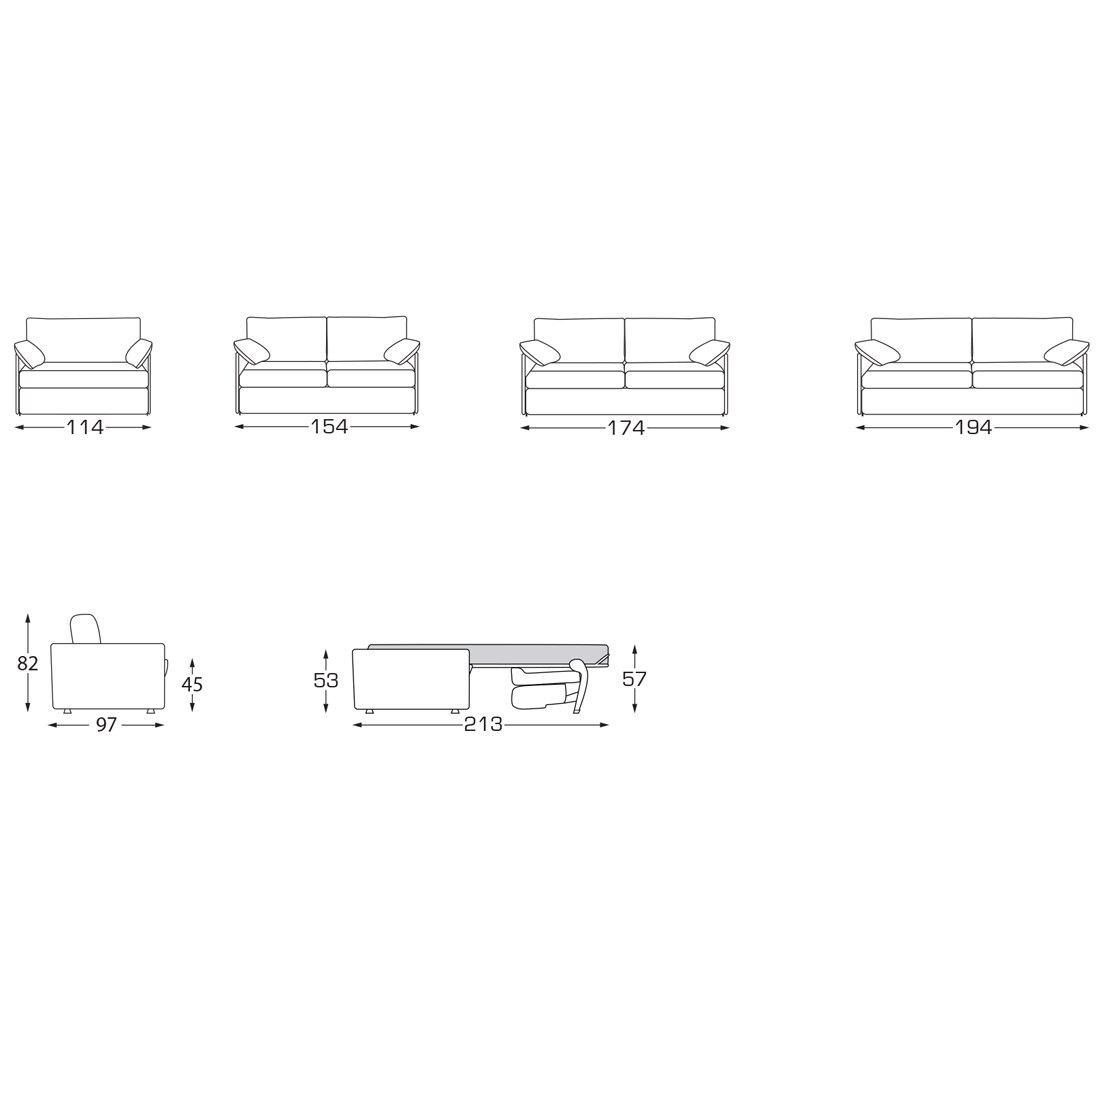 petit canap convertible bastille meubles et atmosph re with fermob ledru rollin. Black Bedroom Furniture Sets. Home Design Ideas